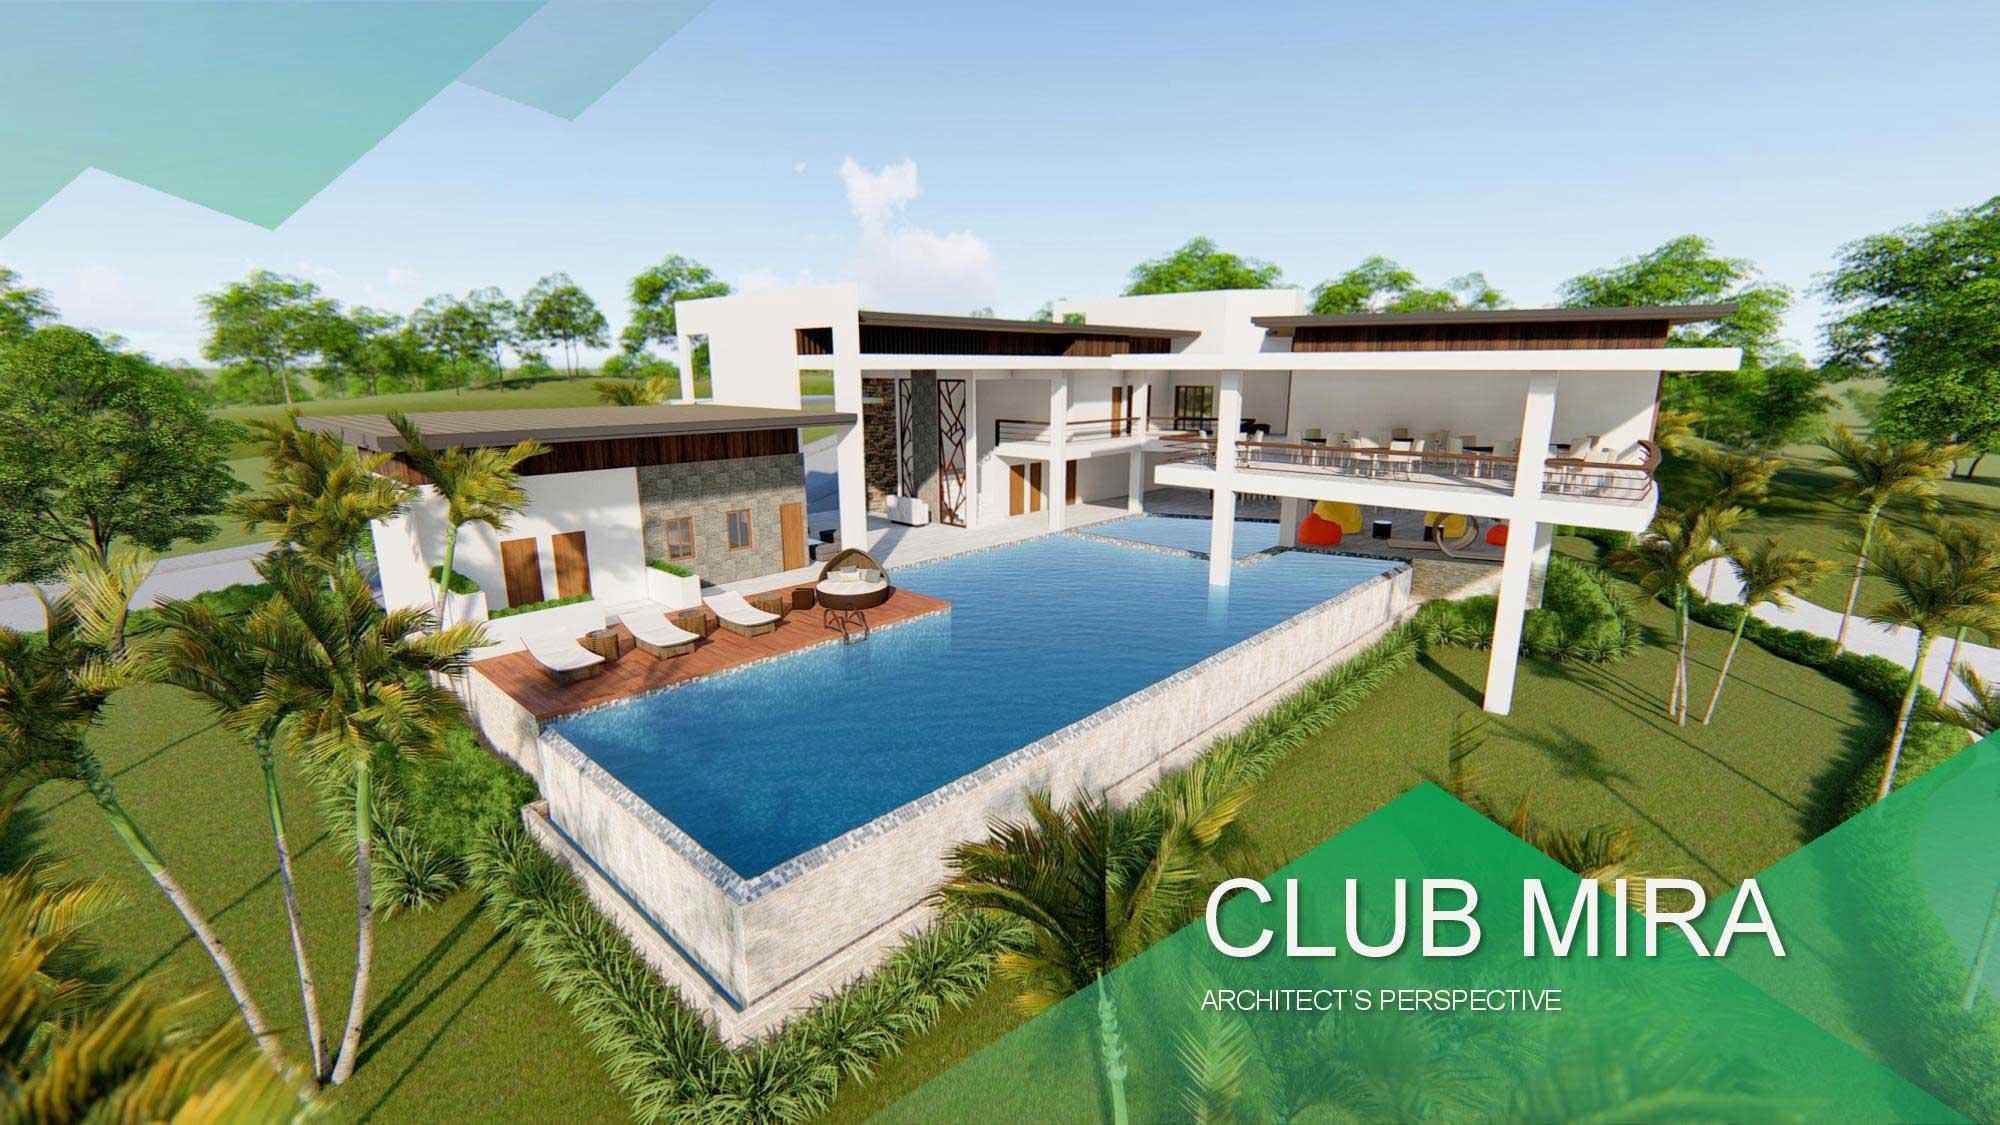 Velmiro heights agusan clubhouse mira web gmc